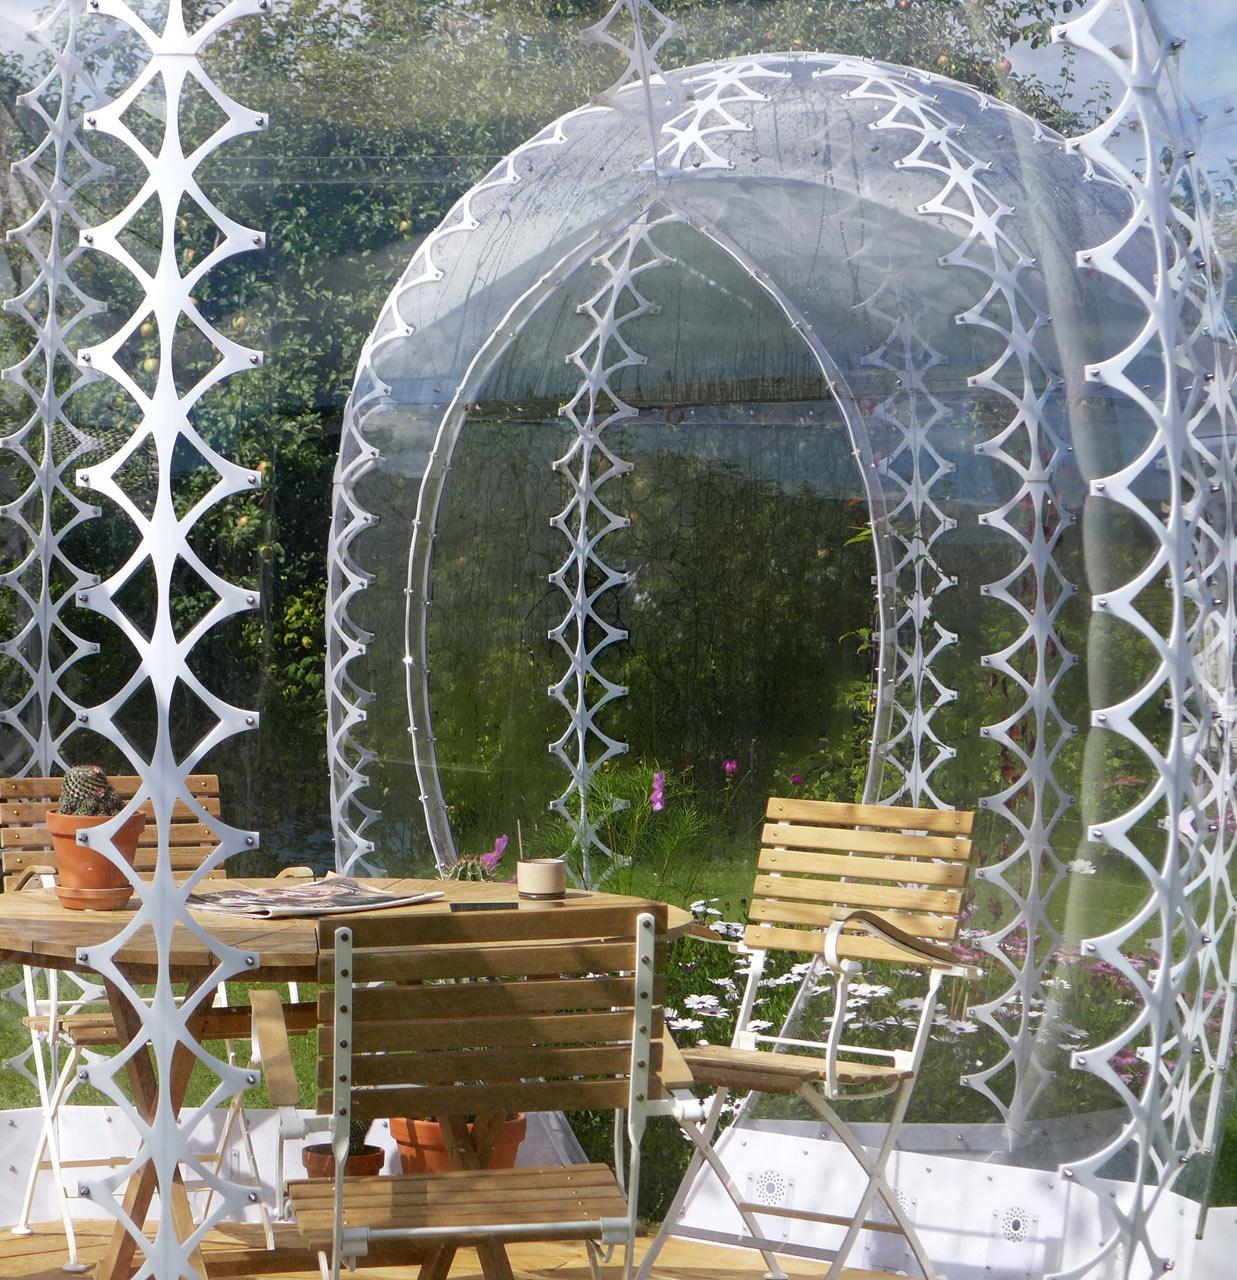 Invisible-Garden-House-Simon-Hjermind-Jensen-4